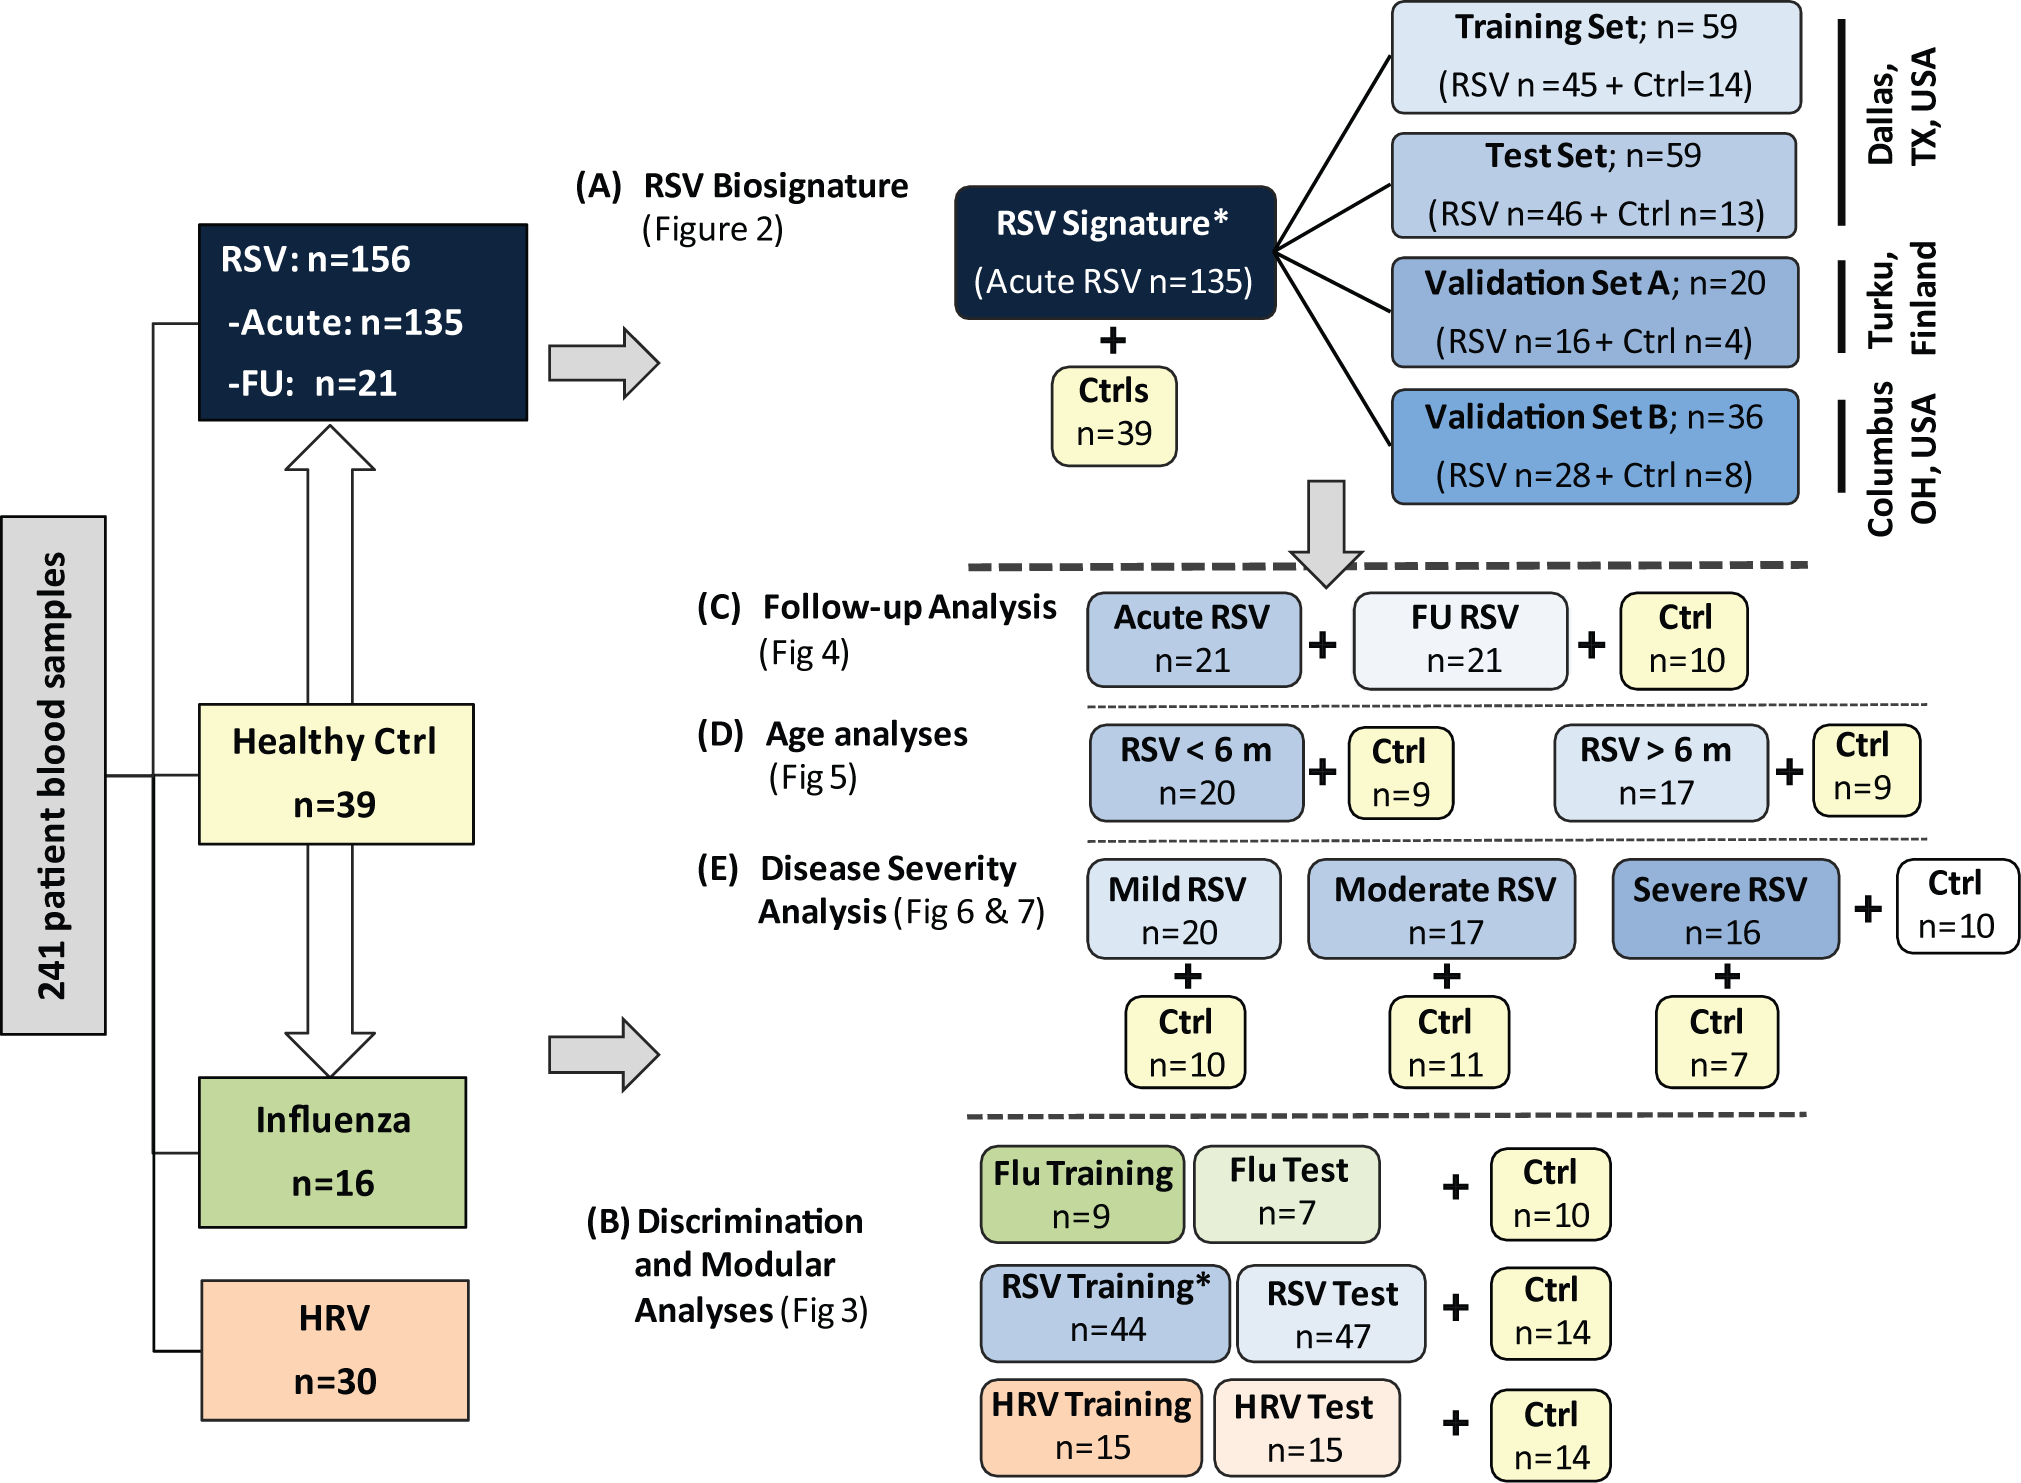 Flow diagram of study patients.